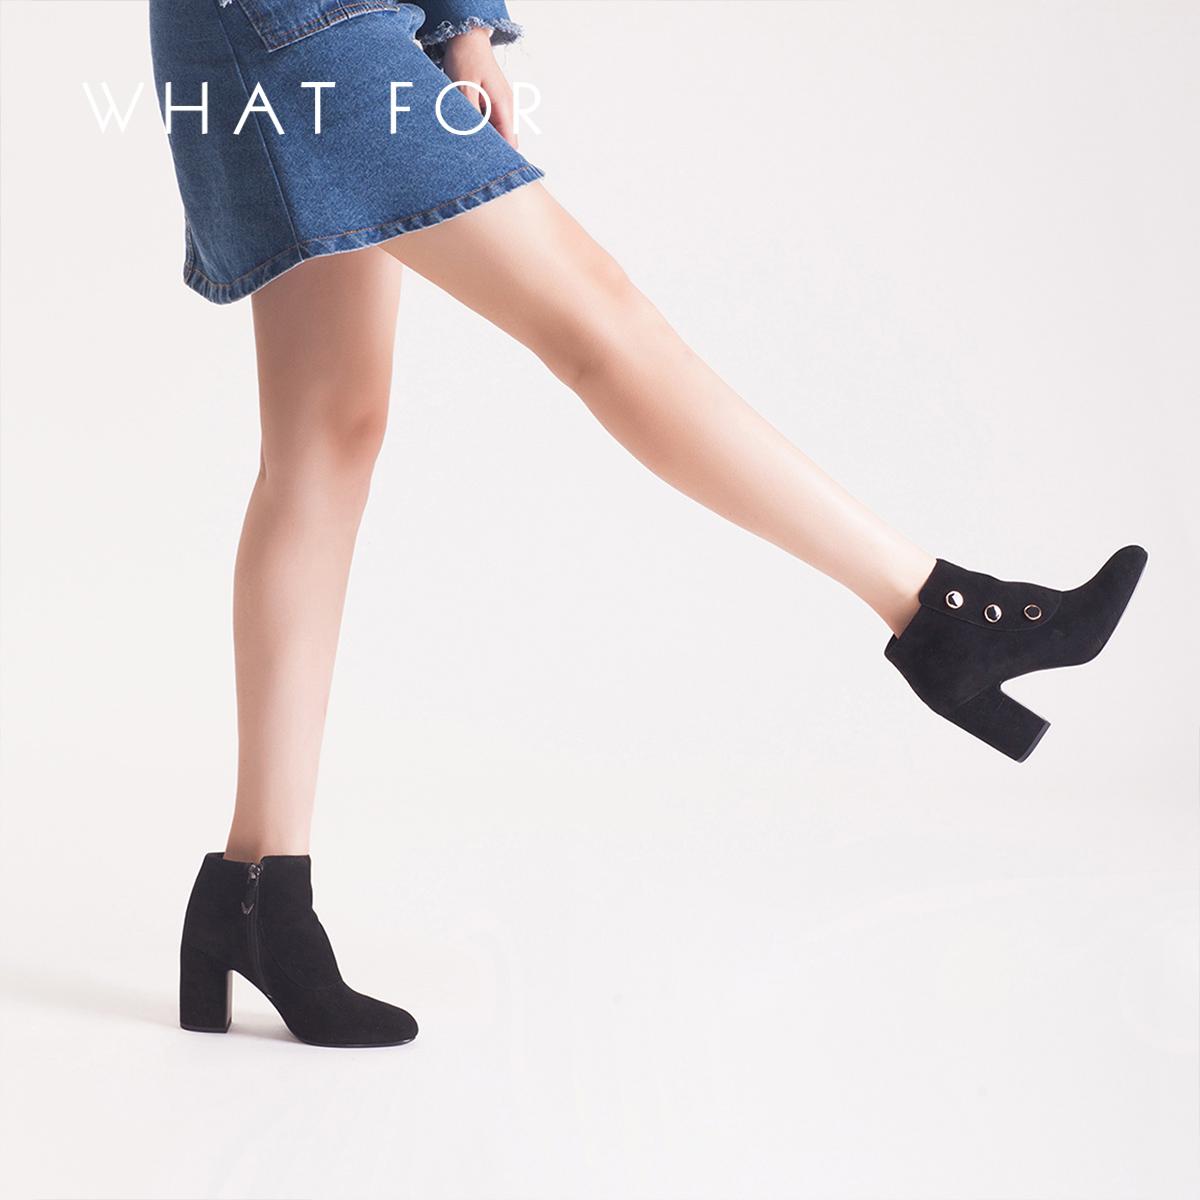 WHAT FOR2018秋冬新款羊反毛圆头时尚粗跟超高跟鞋短筒靴子女短靴